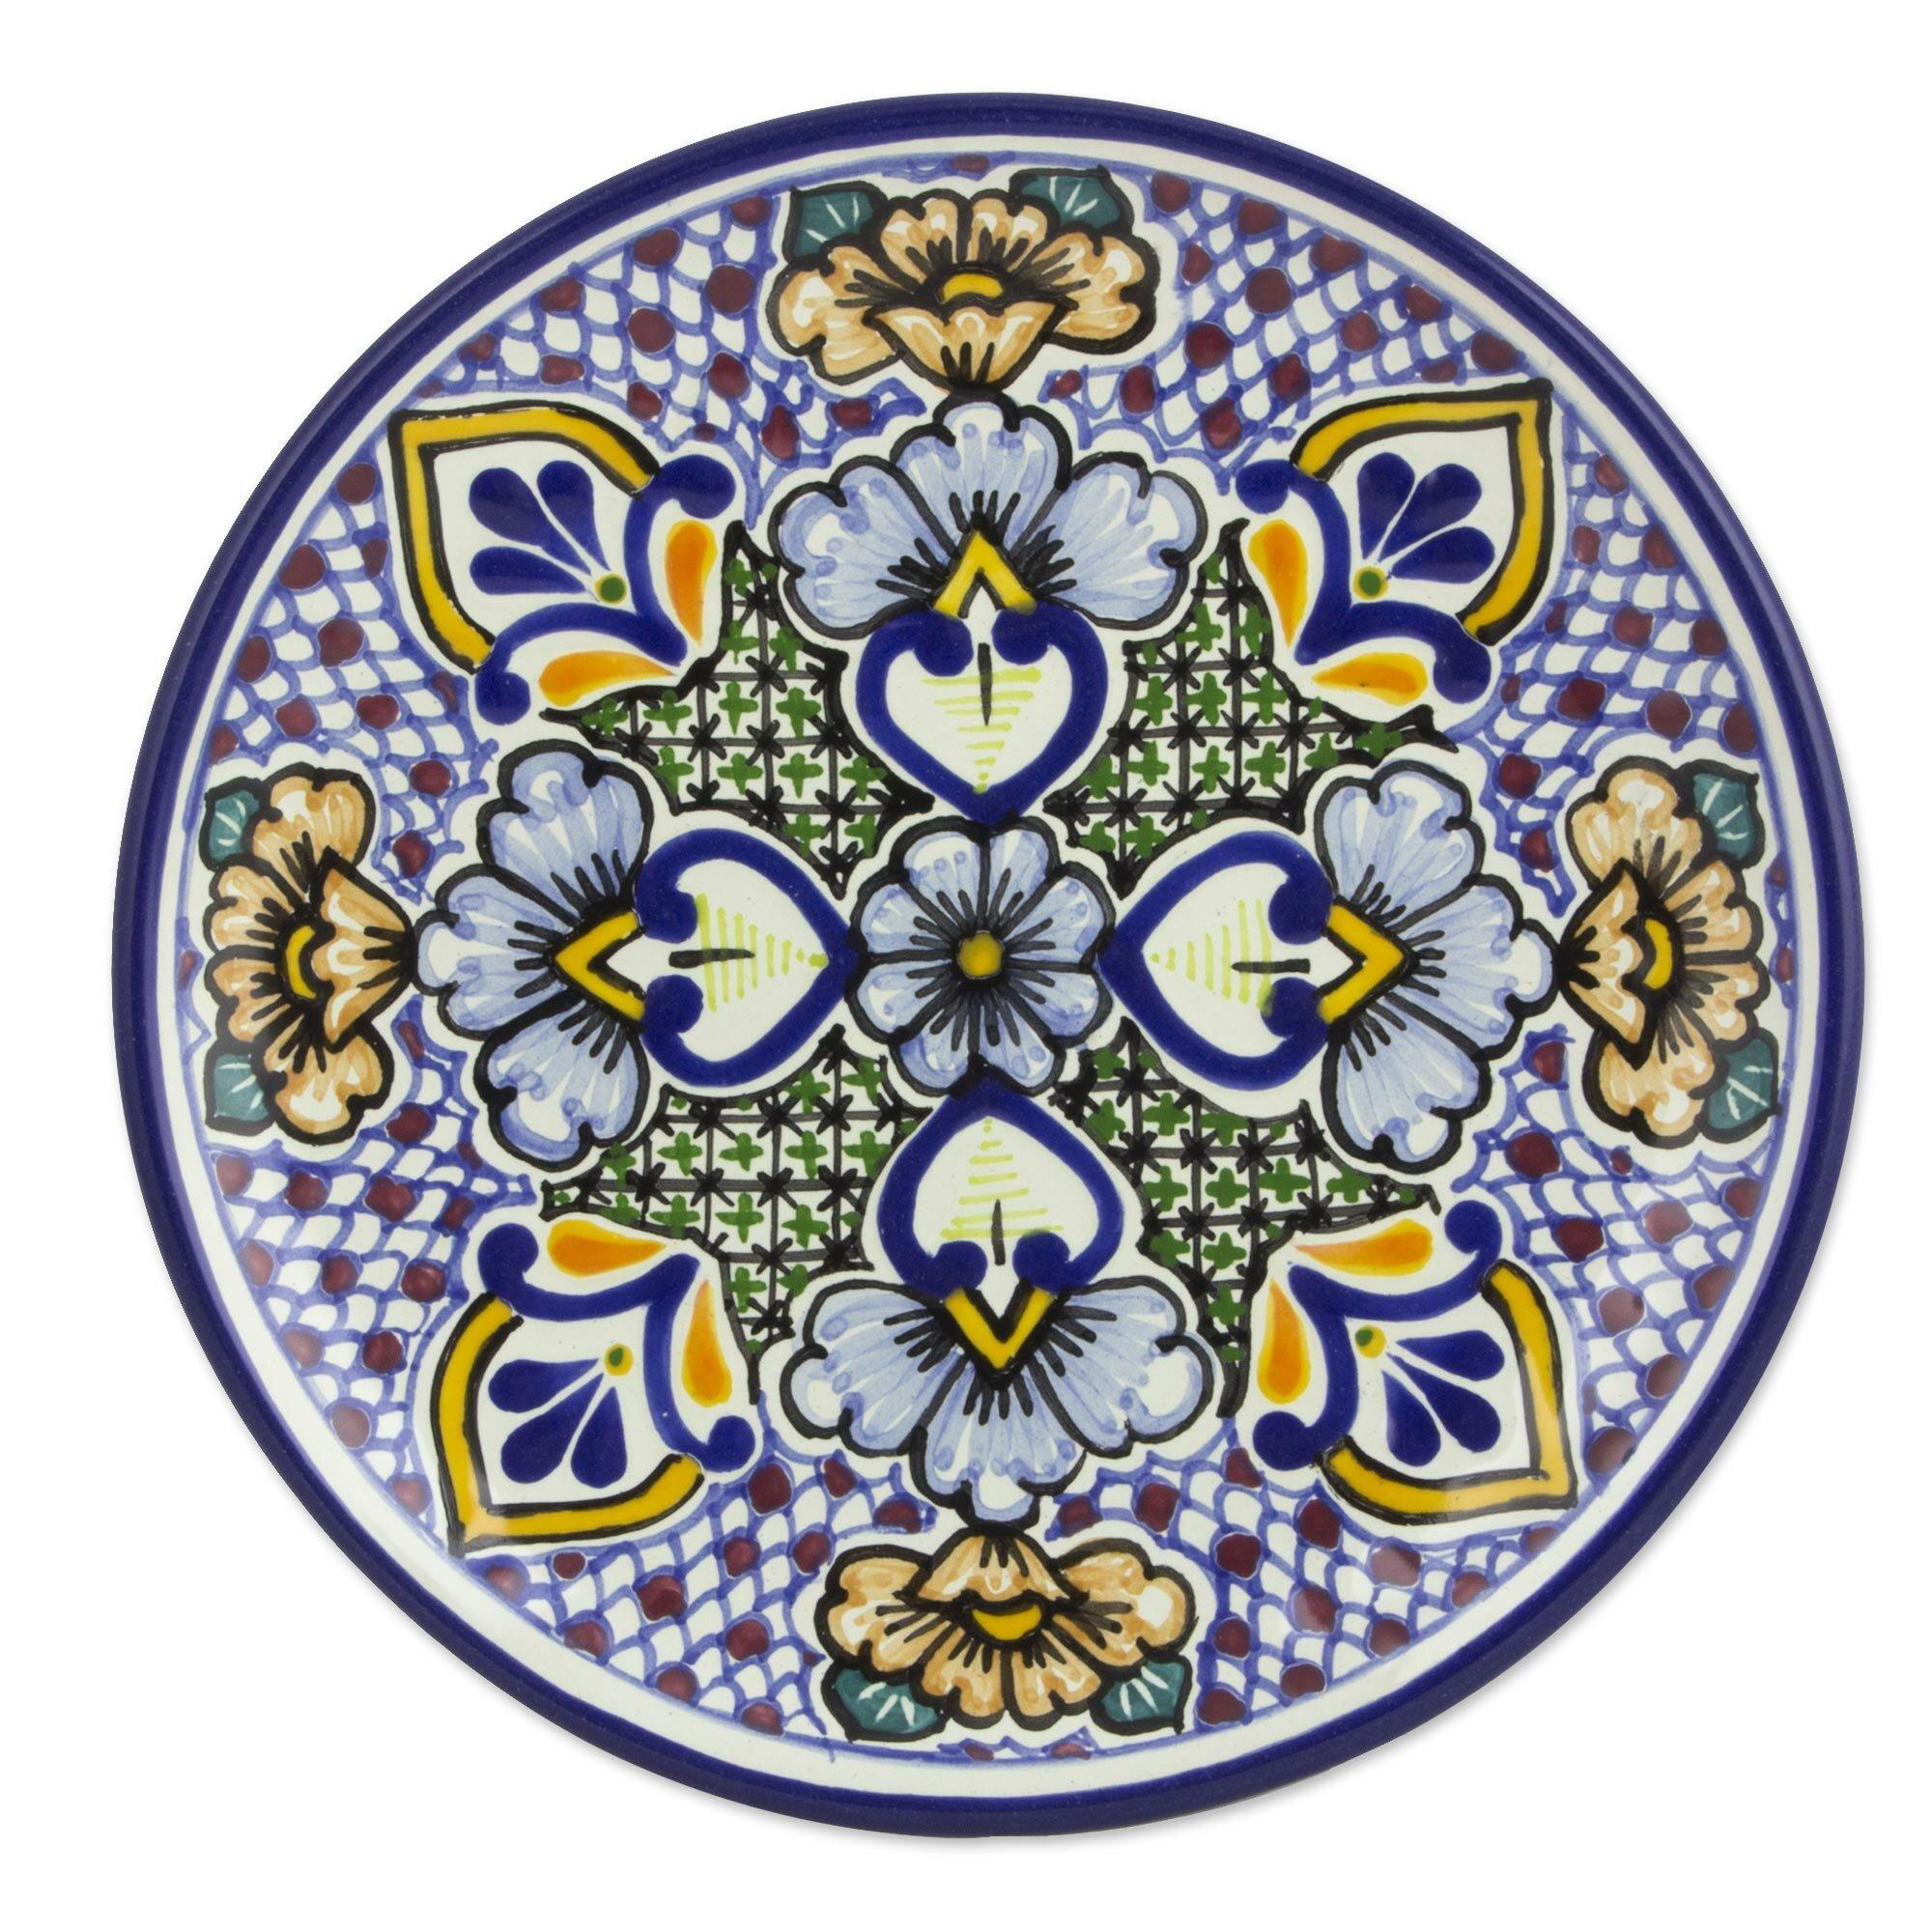 Novica Alonso Luis Mexican 8  Talavera Floral Ceramic Dessert Plates (Pair) | Wayfair  sc 1 st  Wayfair & Novica Alonso Luis Mexican 8